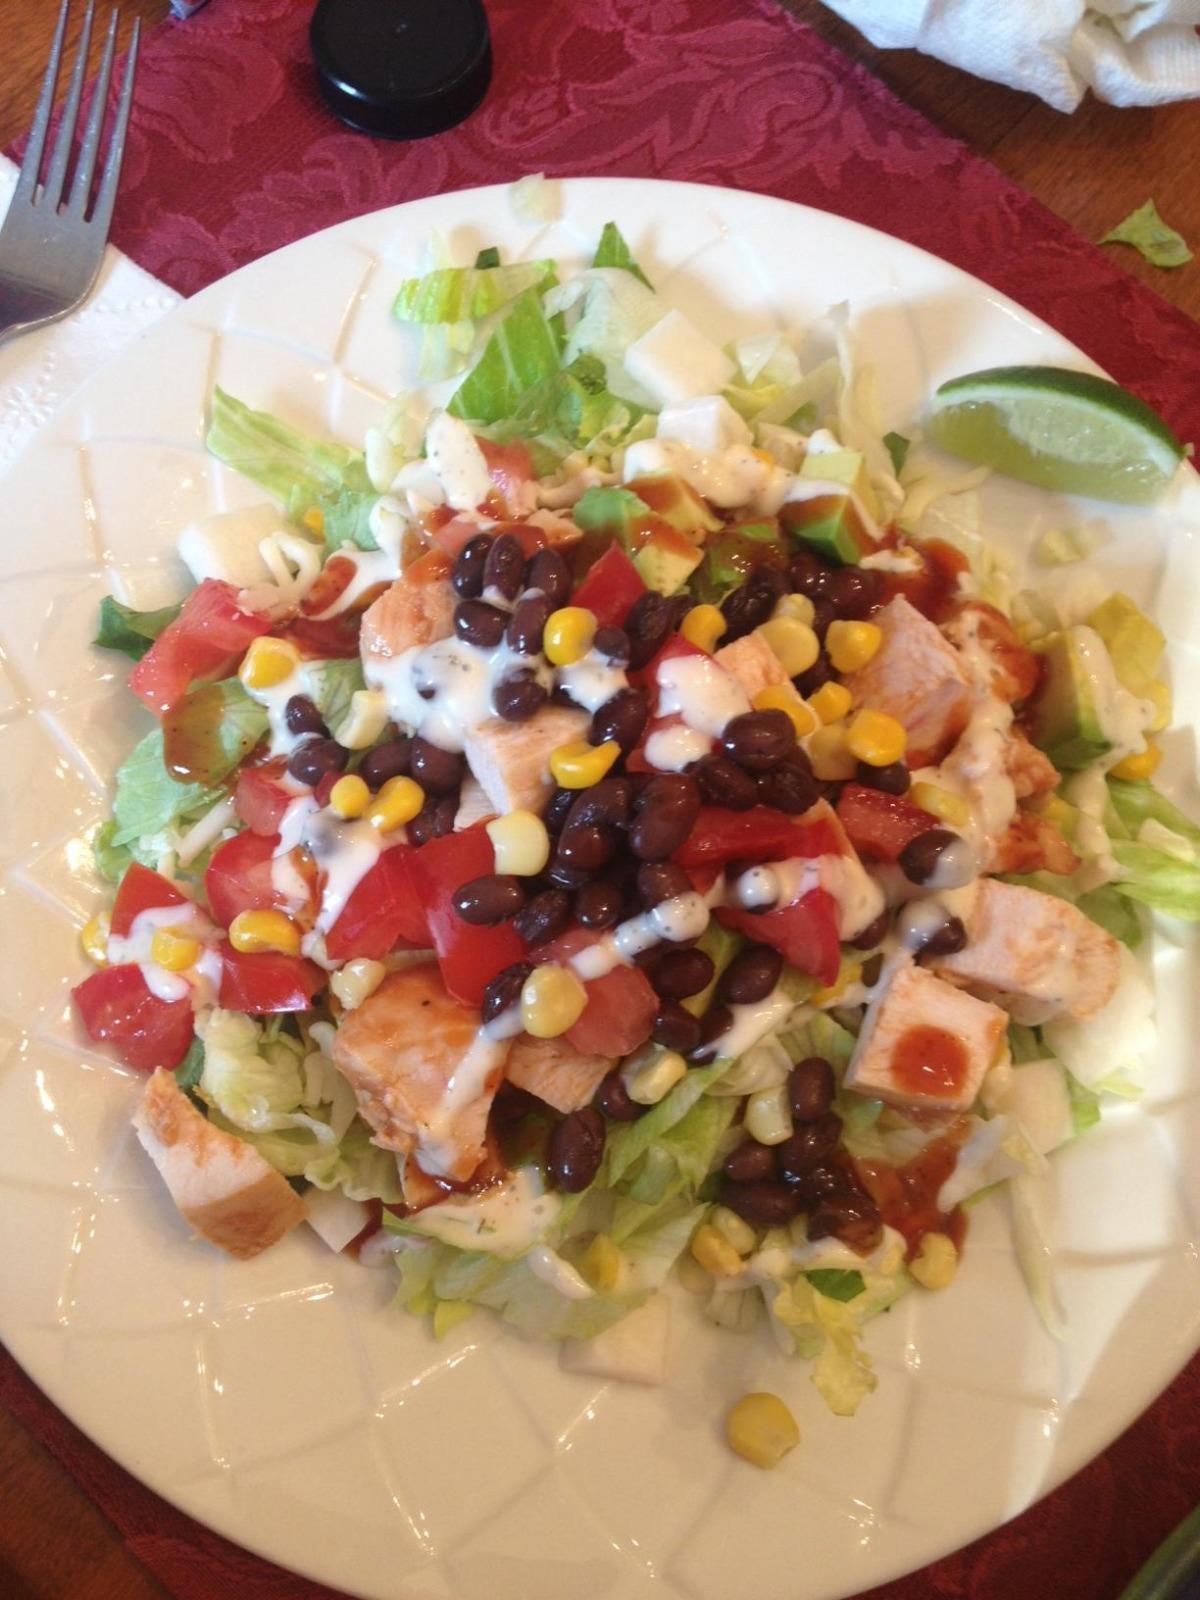 Fabulous California Pizza Kitchens Bbq Chicken Salad Interior Design Ideas Skatsoteloinfo